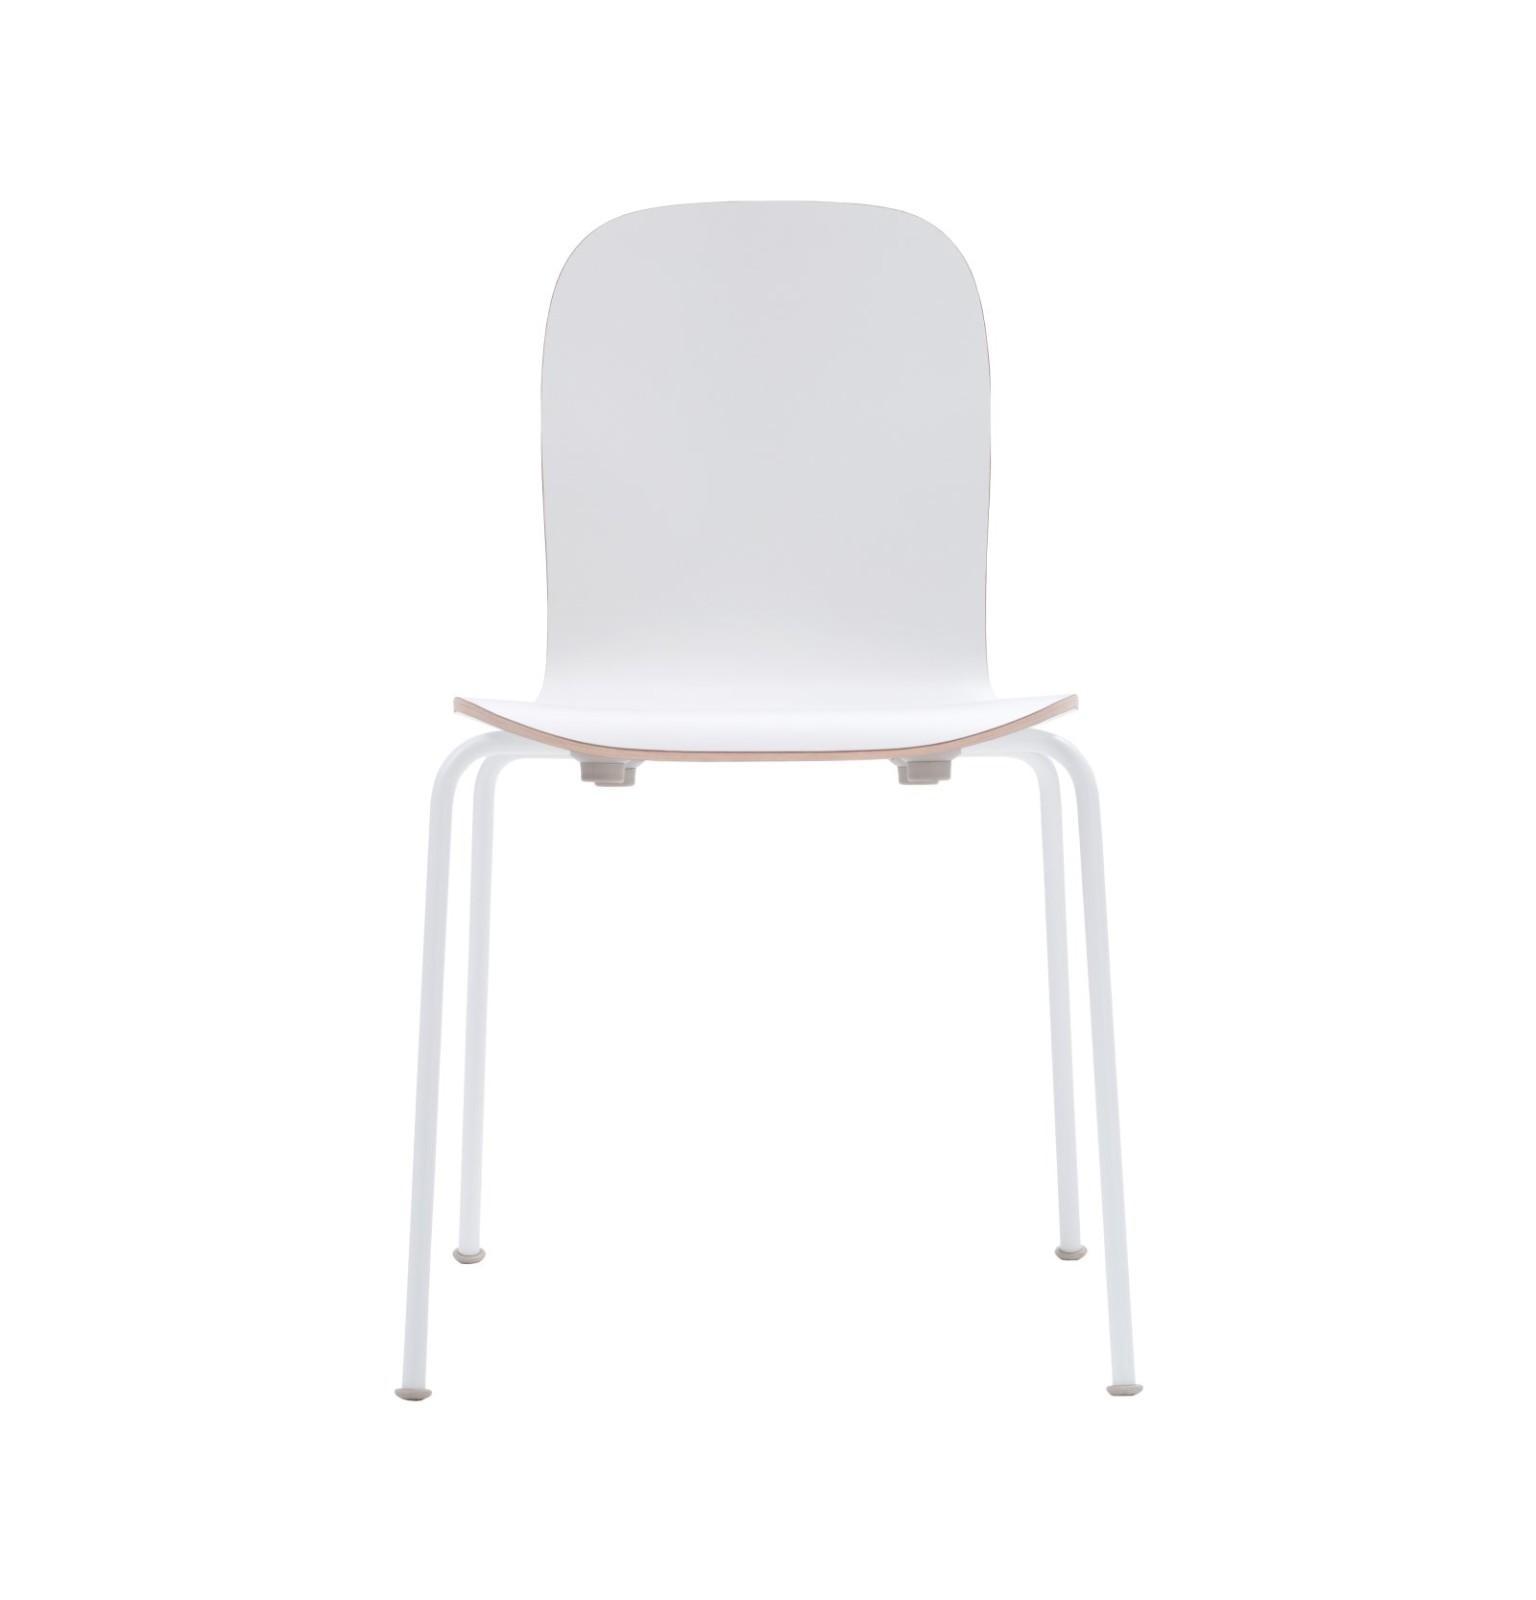 Lounge Chair White Laminate/White/Anthracite